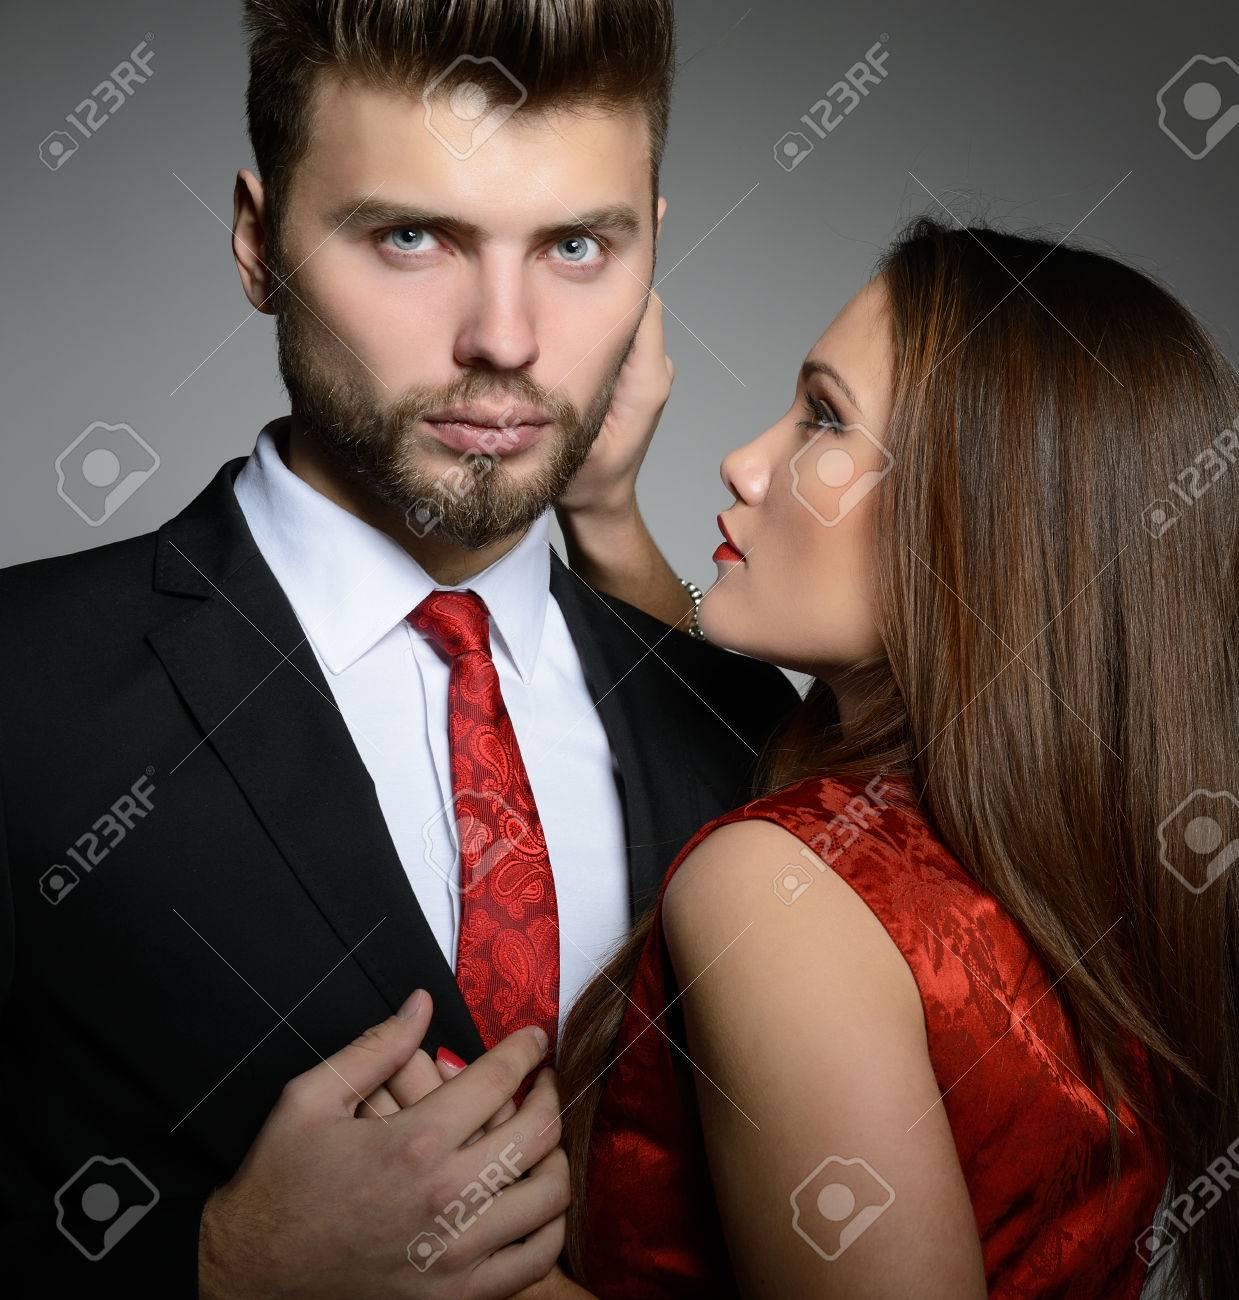 asexuelle Datierung vancouver